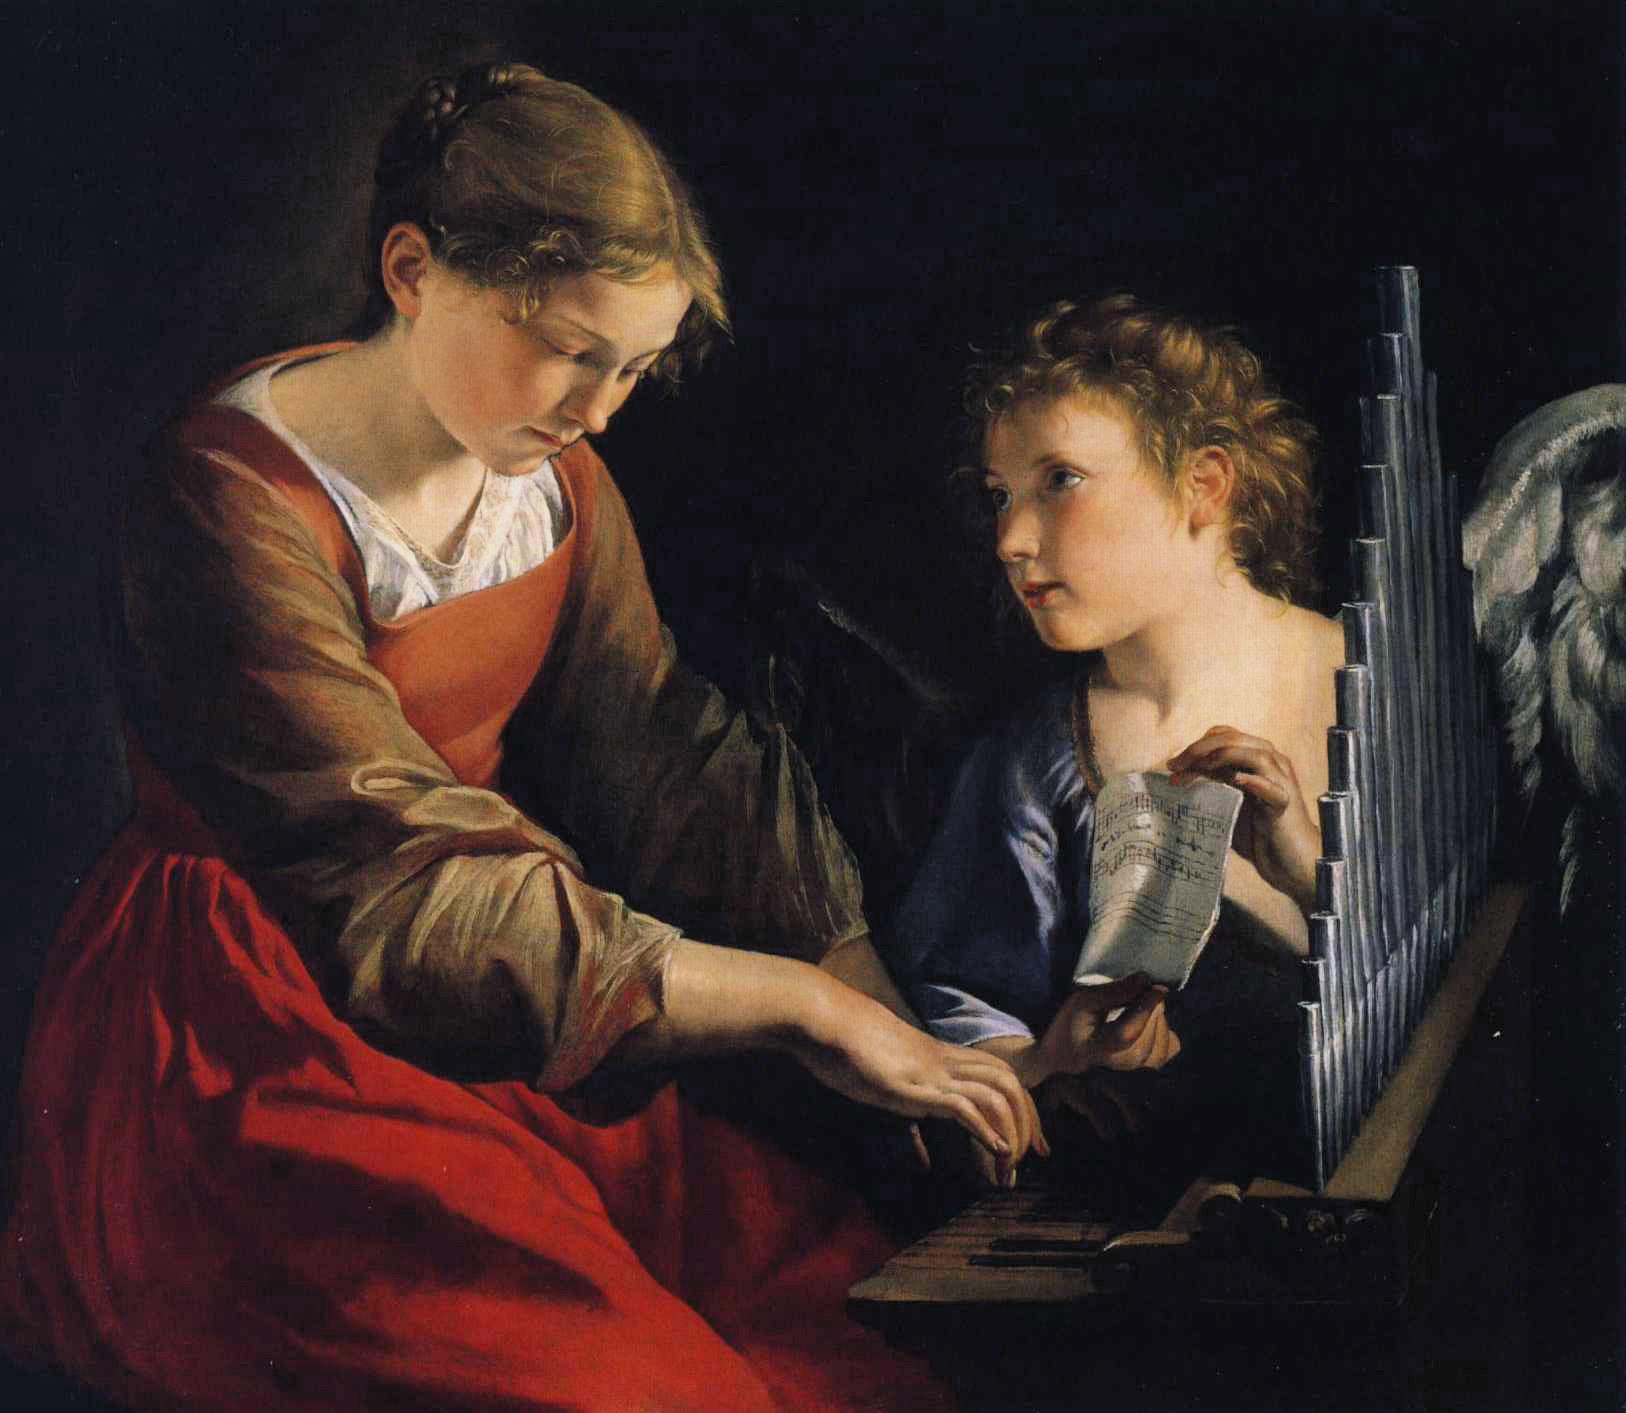 Saint Cecilia with an Angel :: Orazio Gentleschi - Angels in art and painting ôîòî